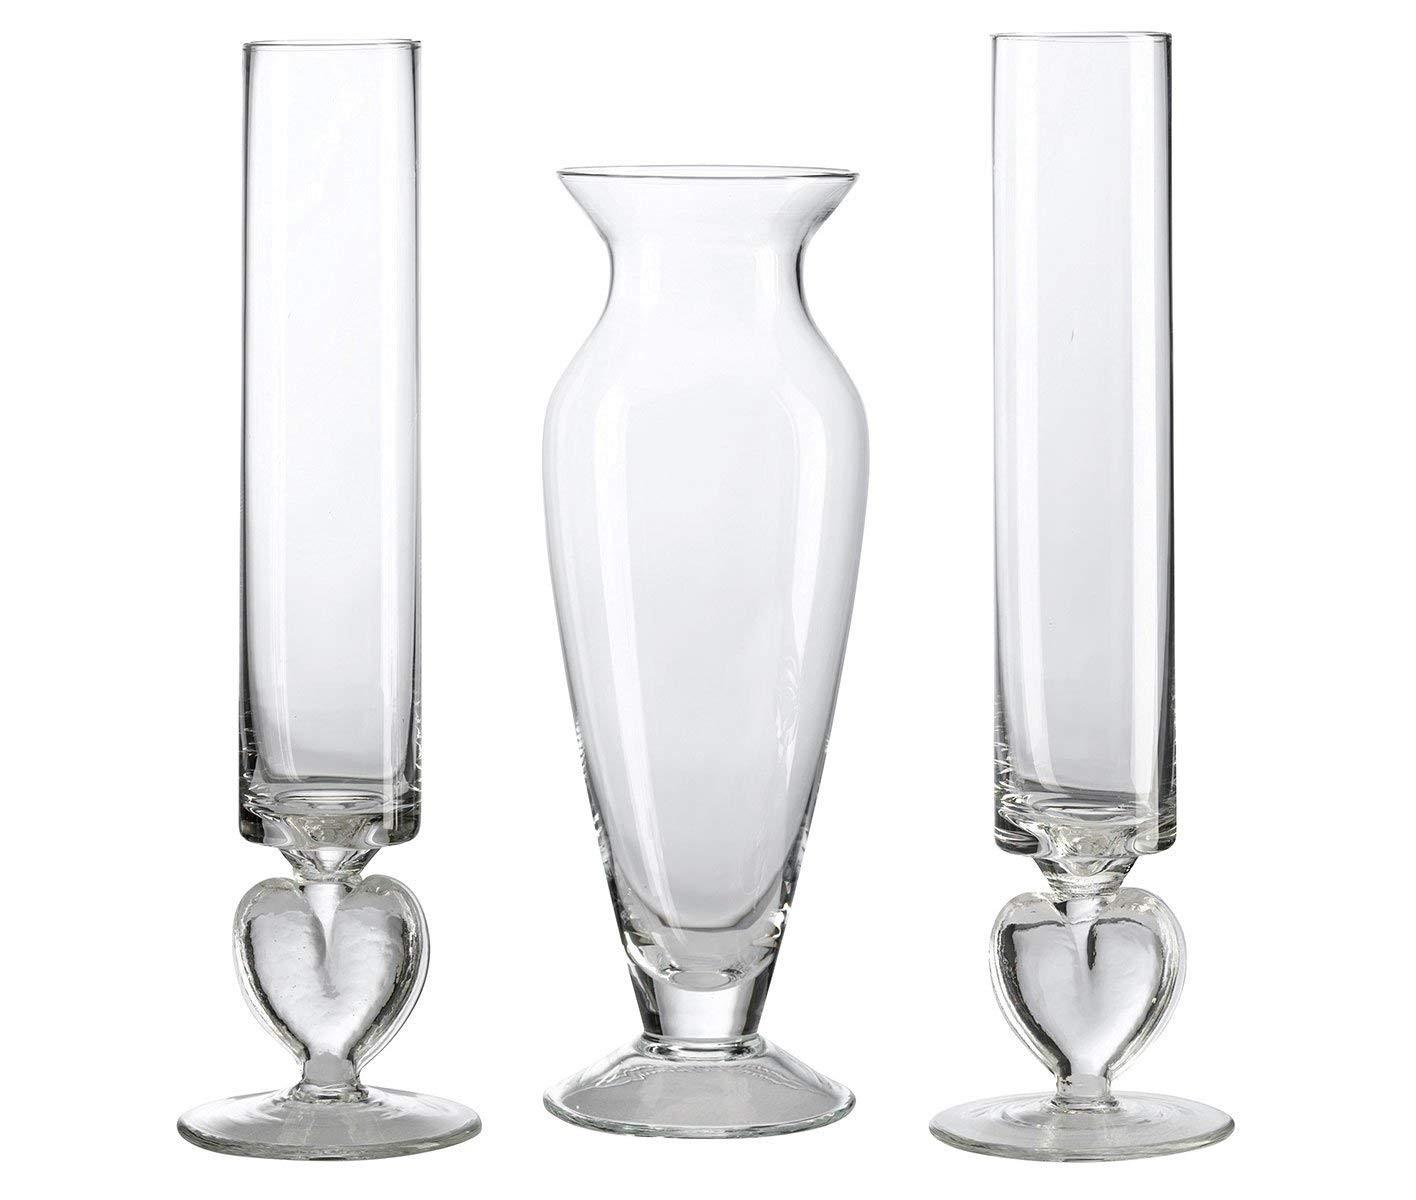 square glass vase set of amazon com lillian rose unity sand ceremony wedding vase set home pertaining to amazon com lillian rose unity sand ceremony wedding vase set home kitchen